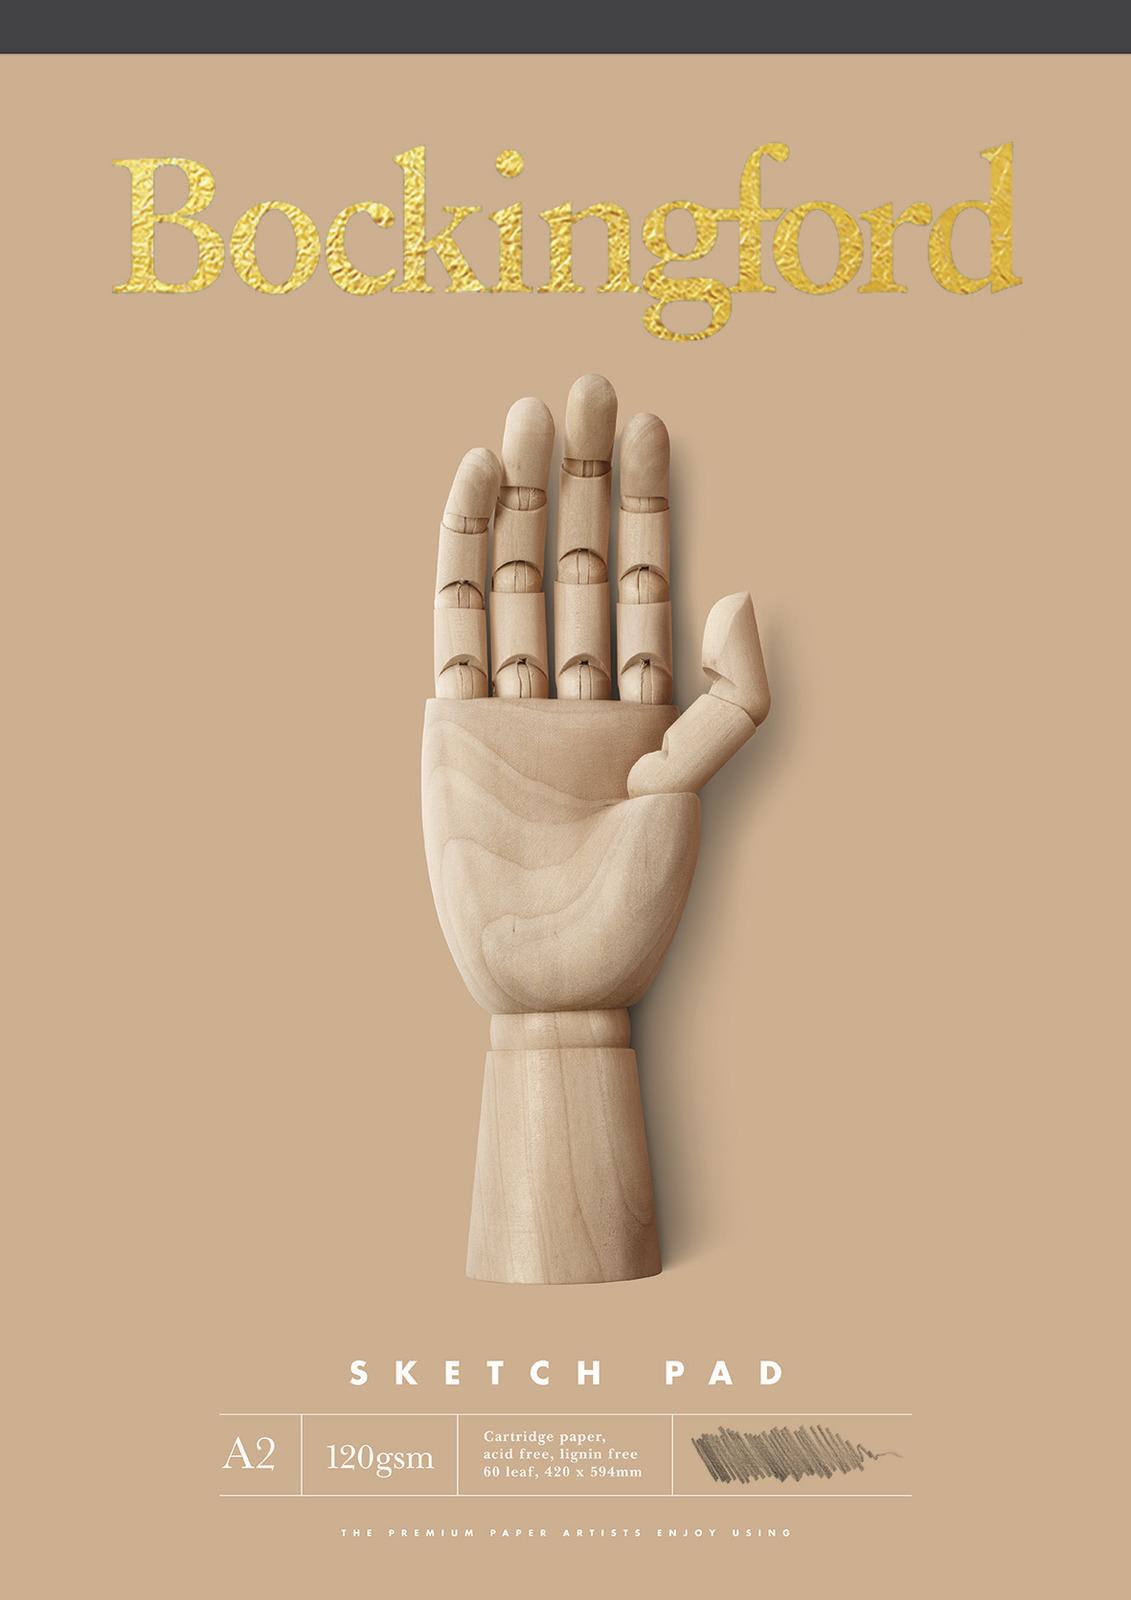 Bockingford: A2 B.21 Sketch Pad image